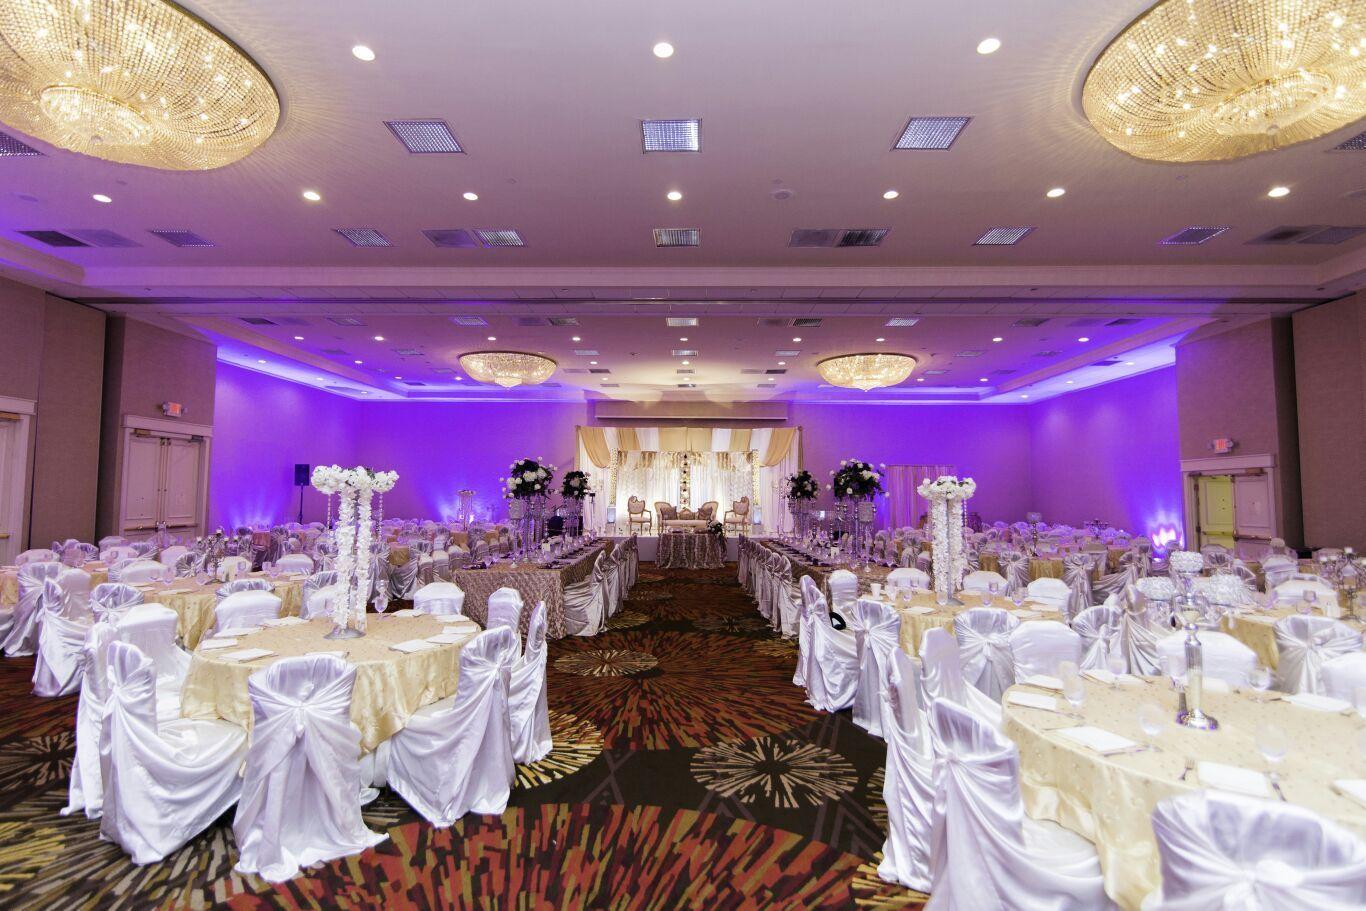 Melange Ballroom Wedding Venues in Houston with beautiful Interiors ...